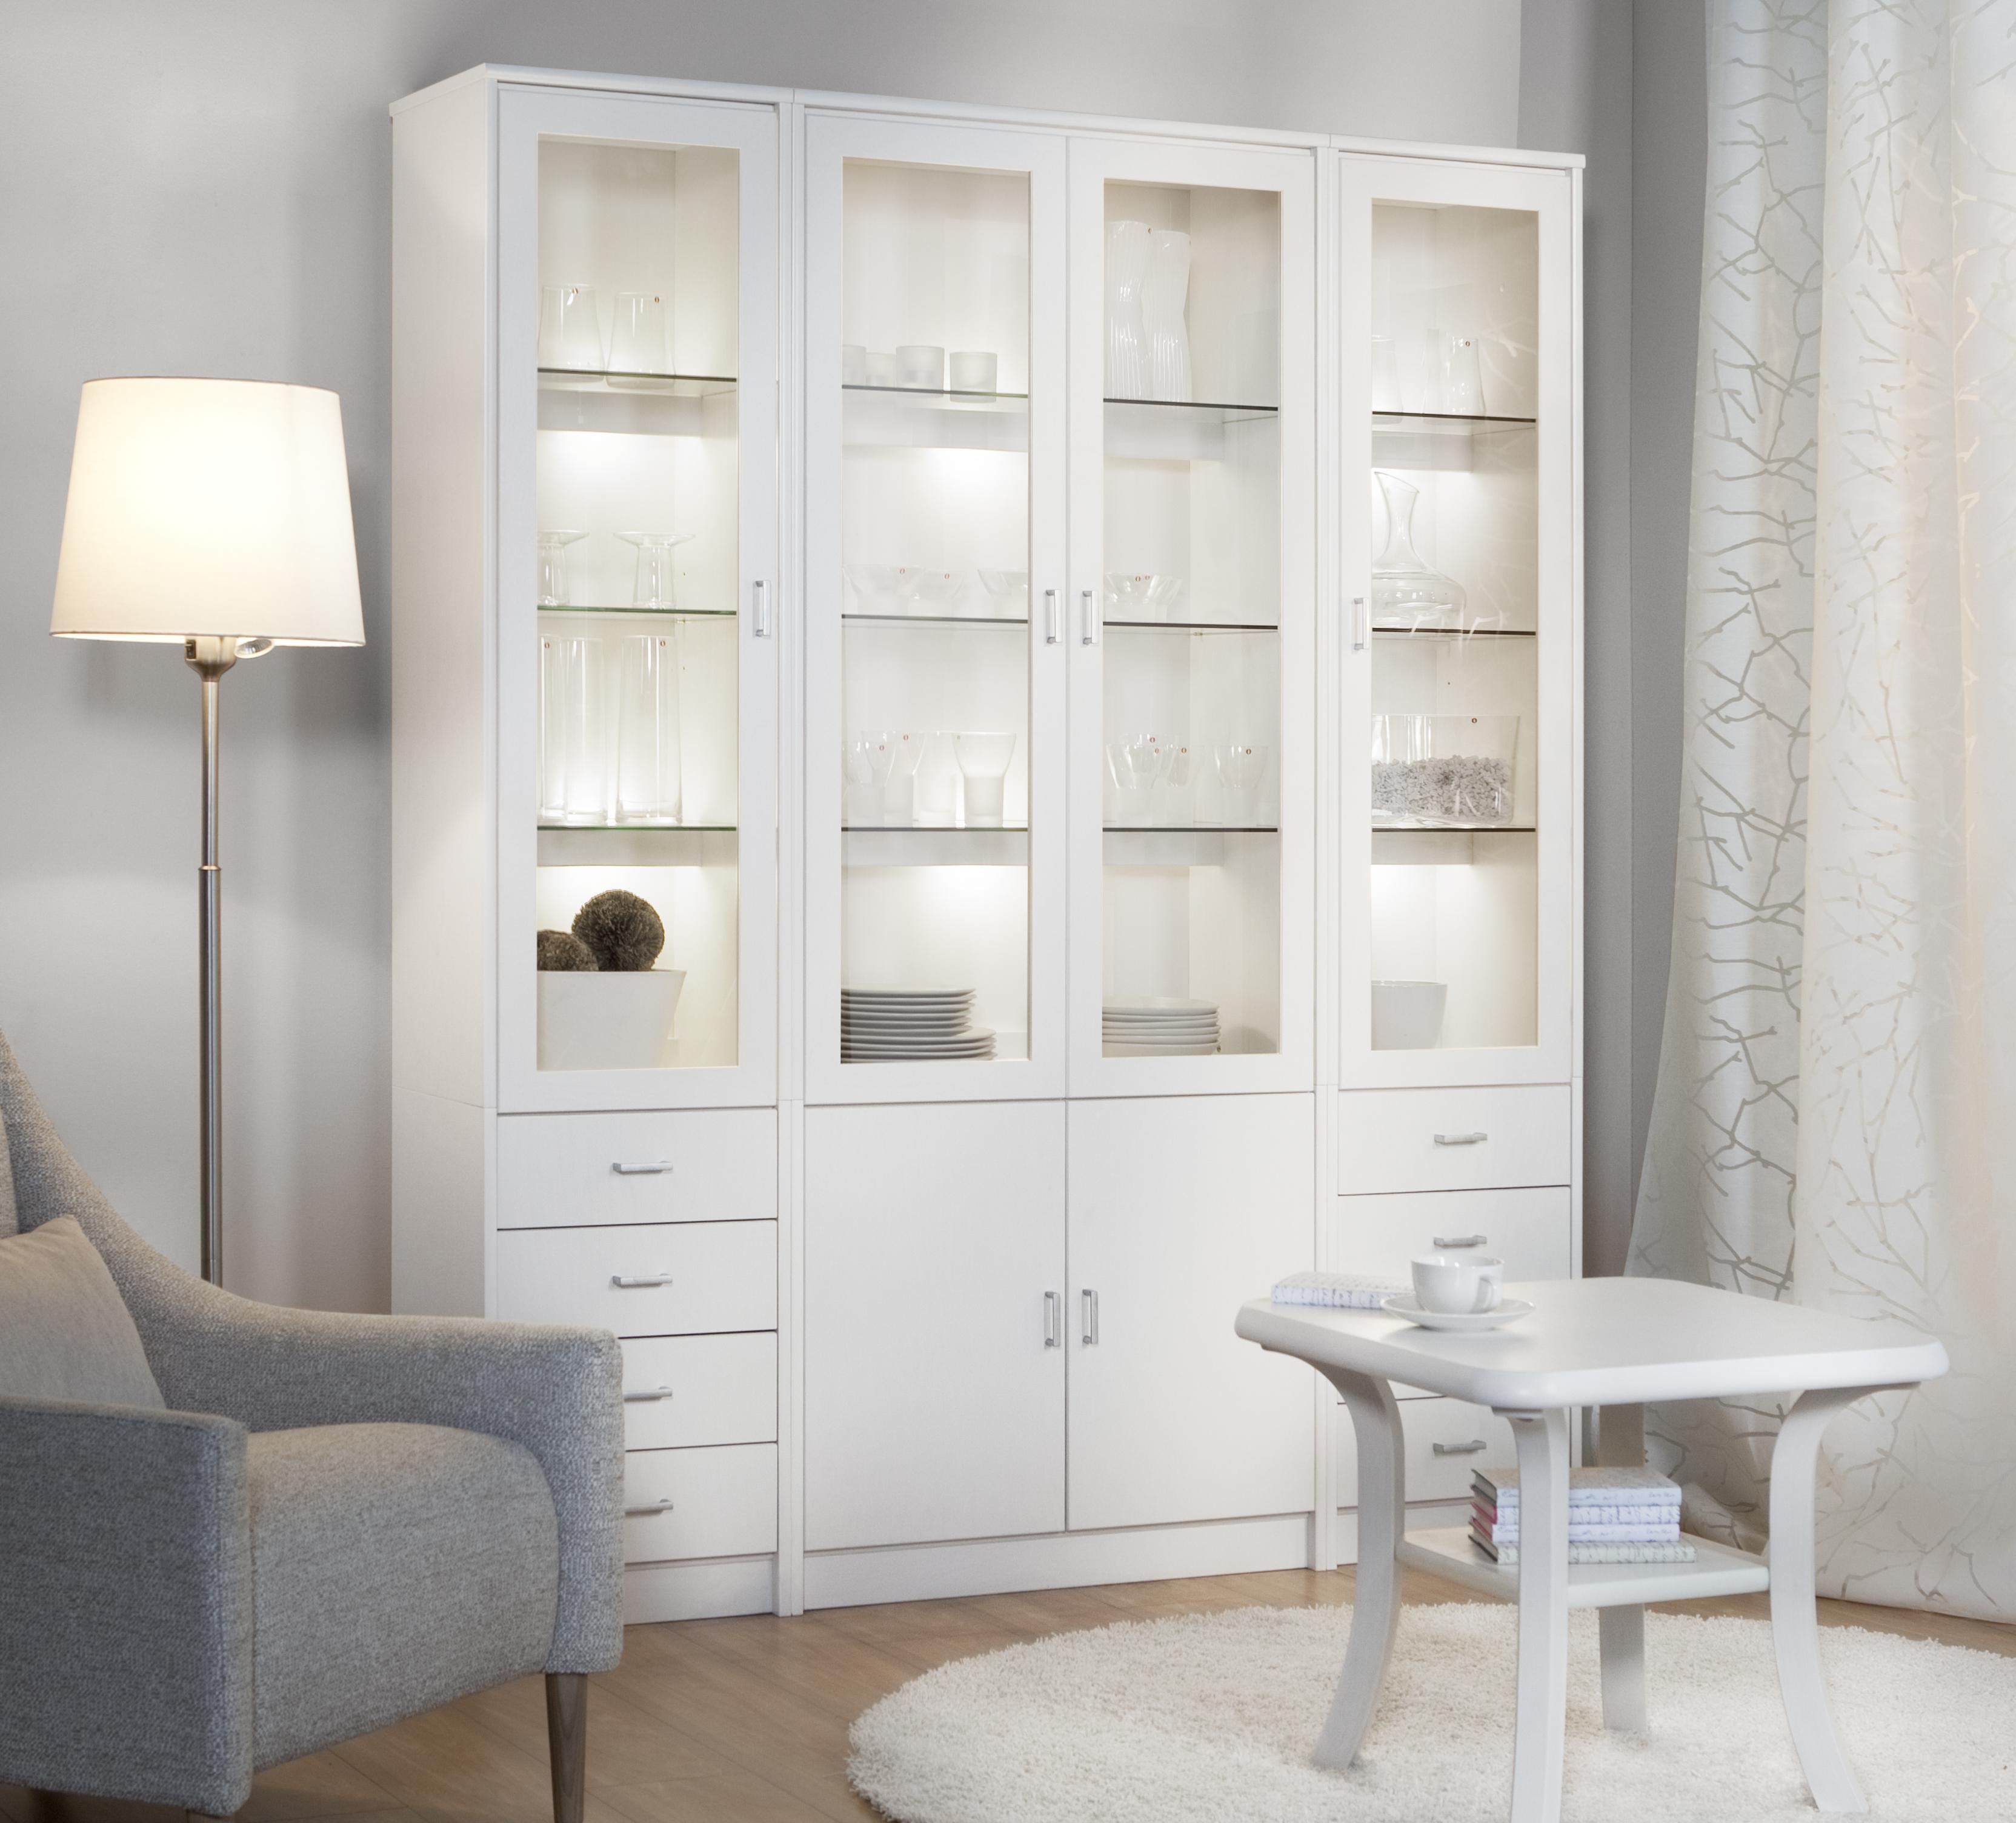 Buztic com bokhylla ek vit ~ Design Inspiration für die neueste Wohnkultur